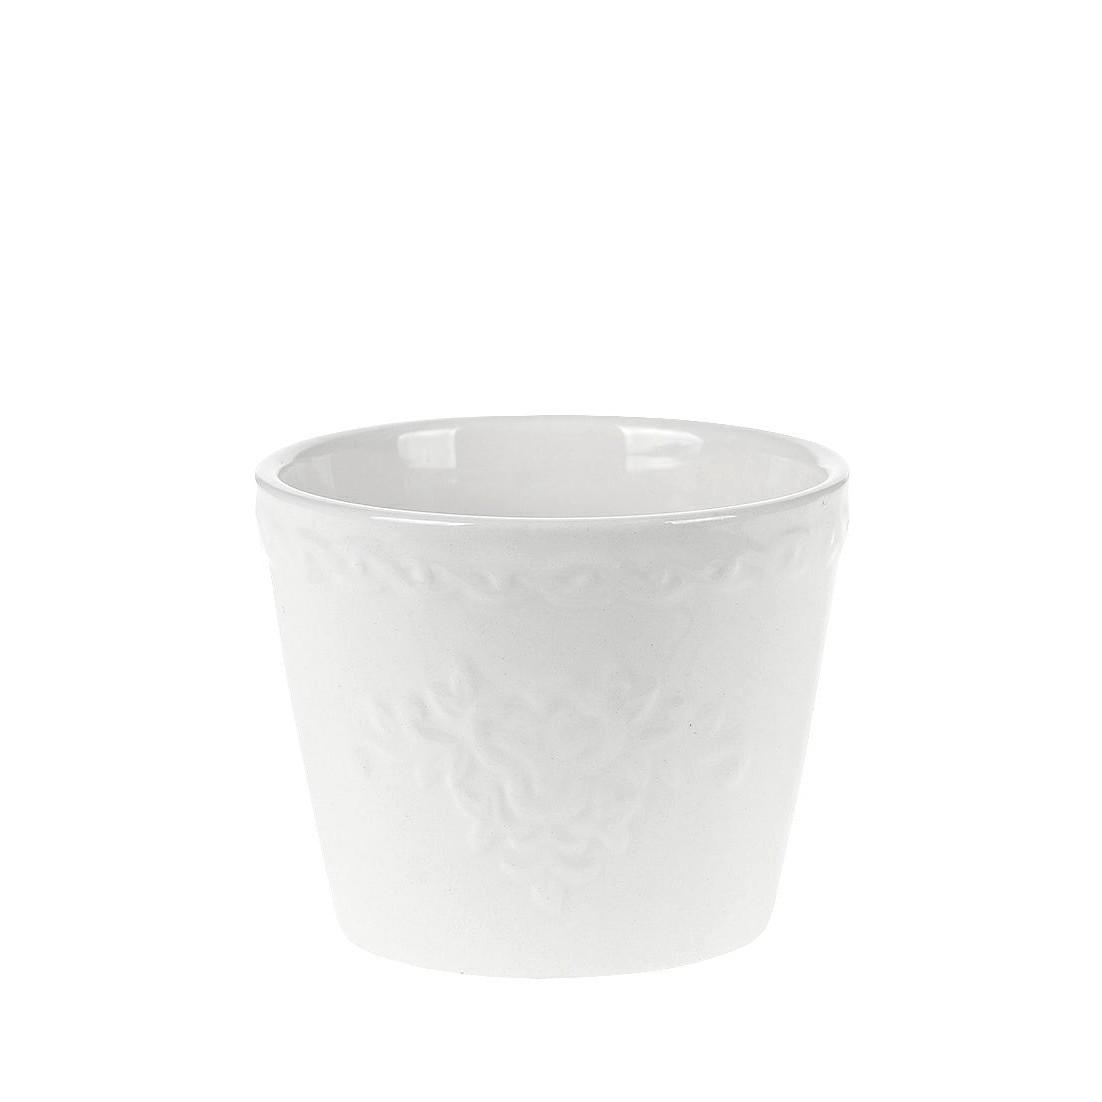 Vaso Decorativo de Ceramica Branco 7 cm